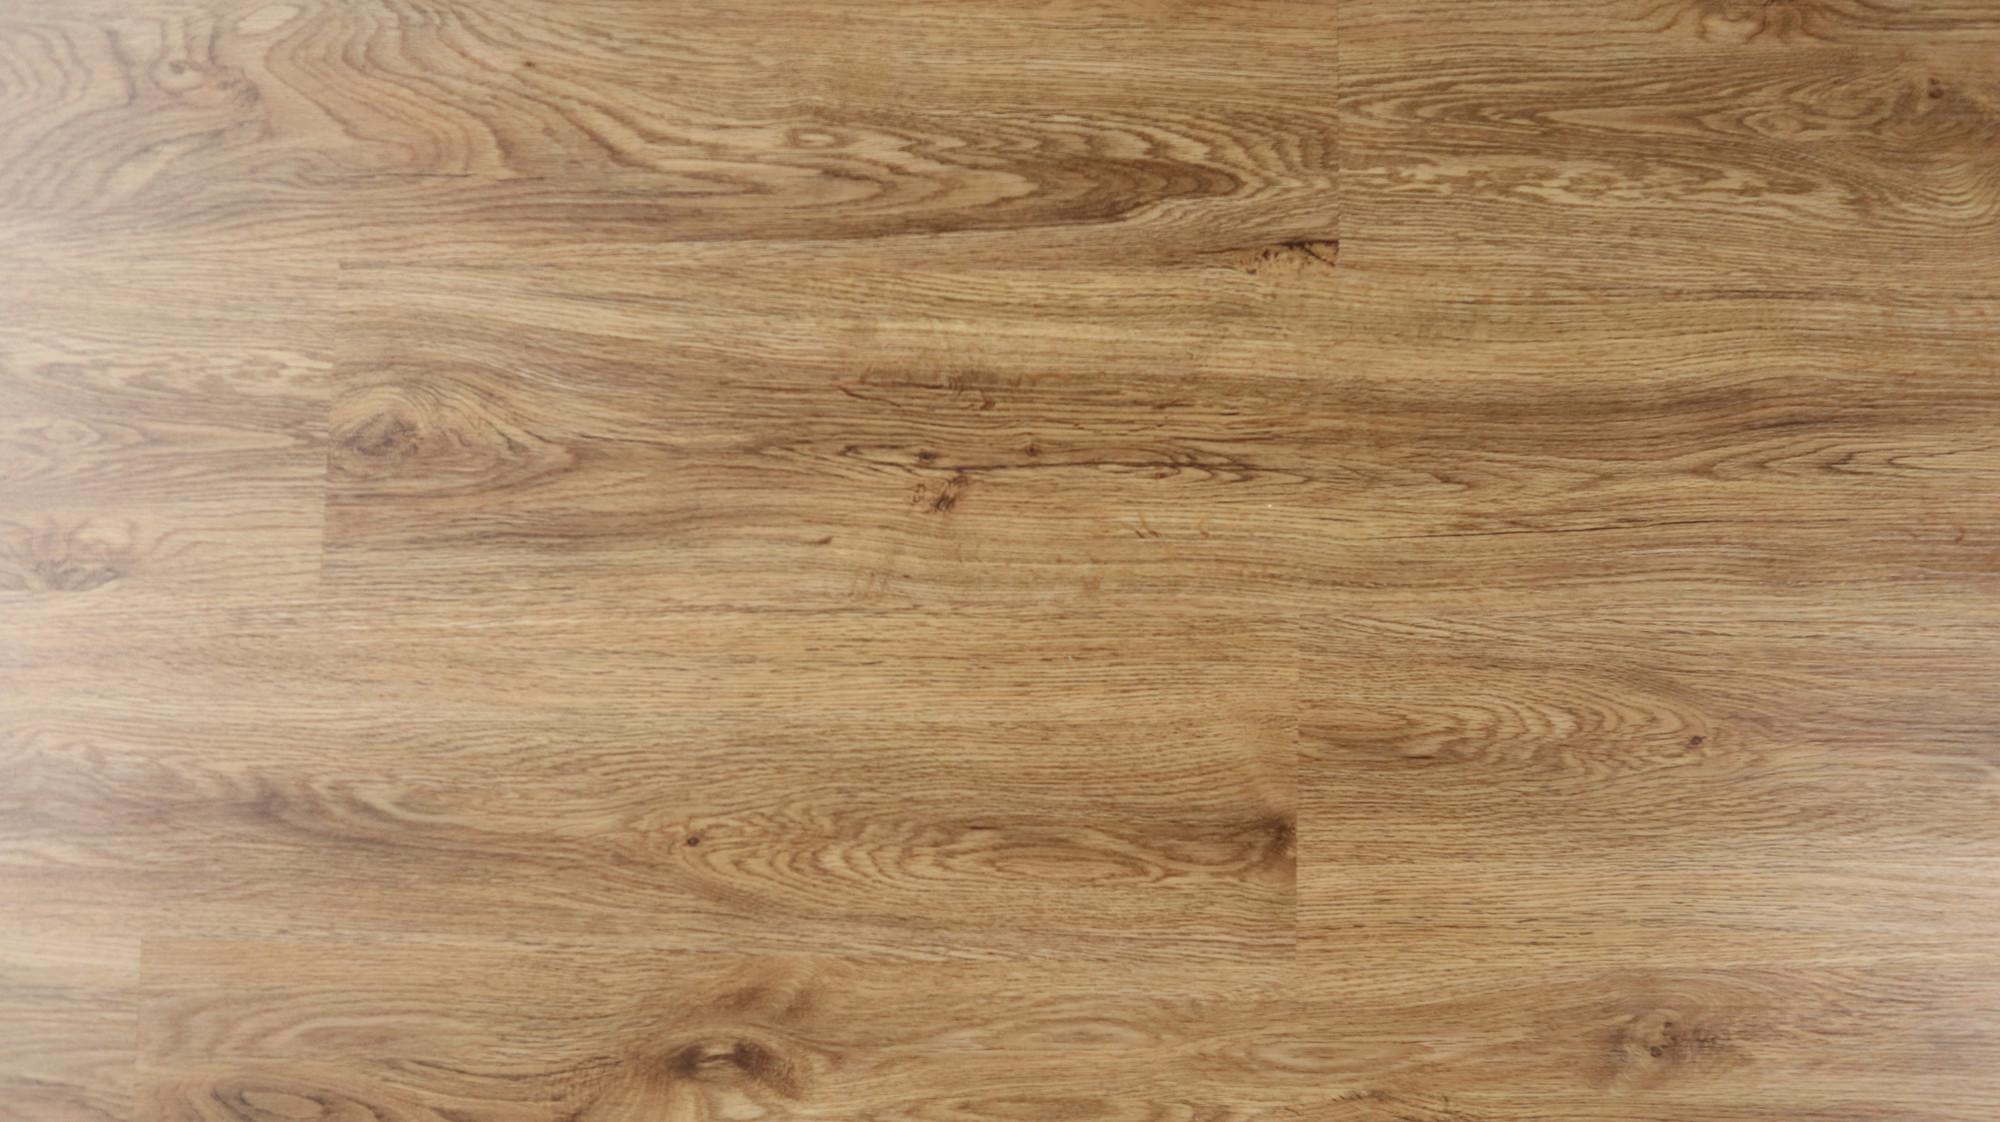 Ivt flooring manufacturers